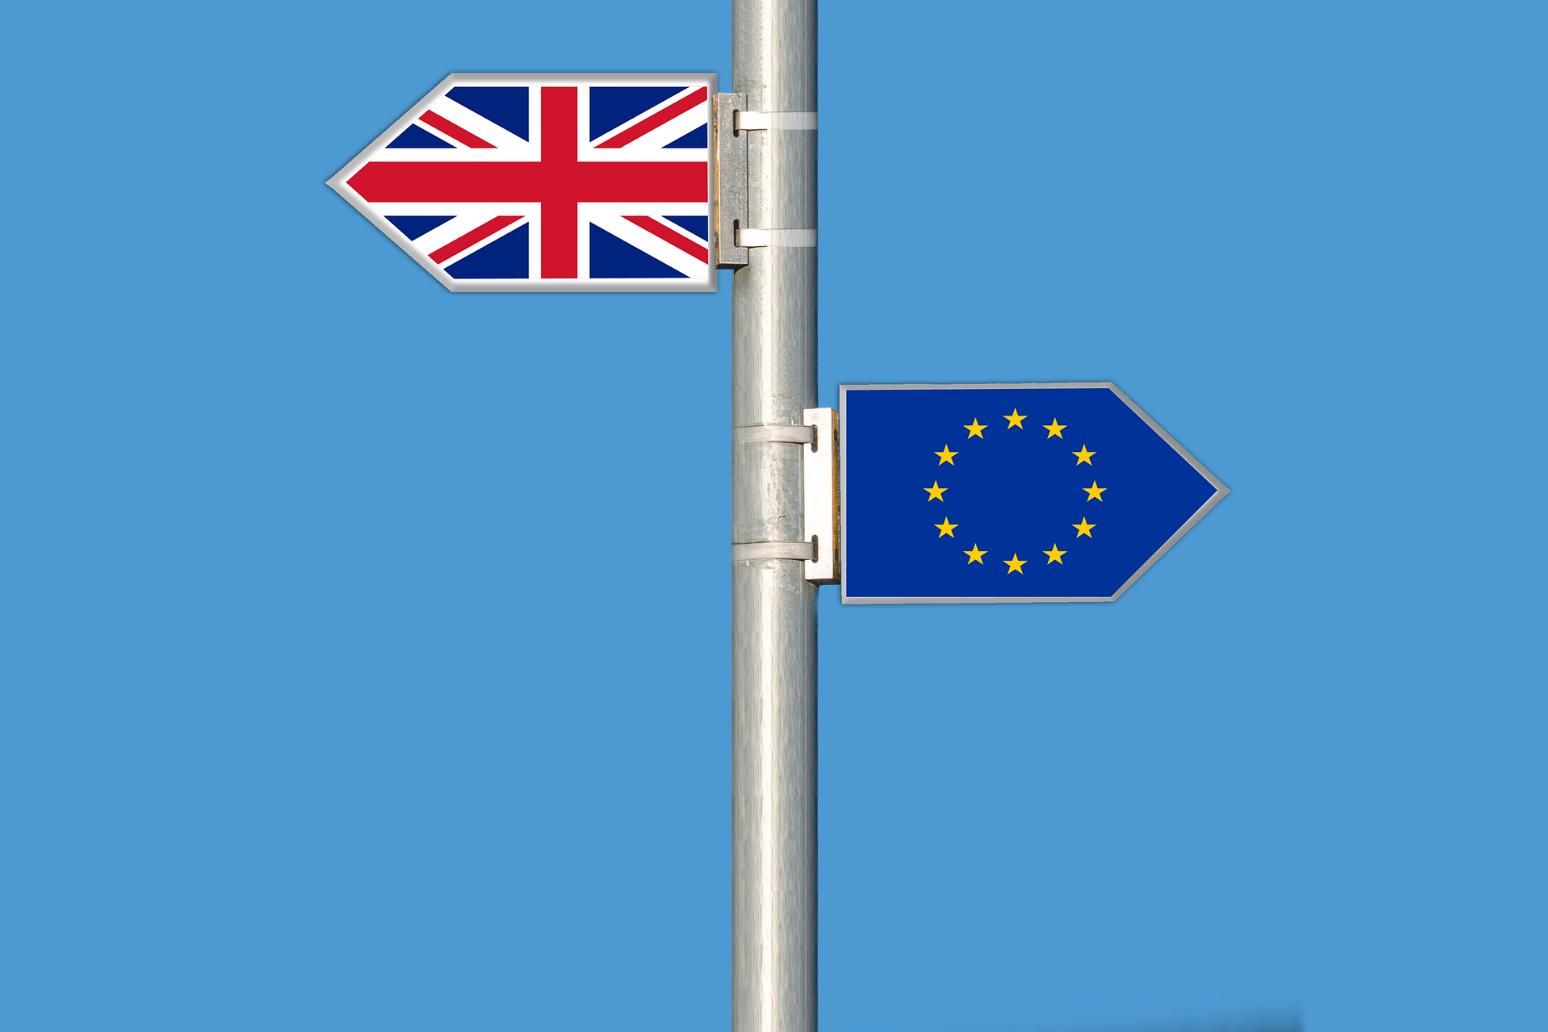 Optimism for Brexit deal rises